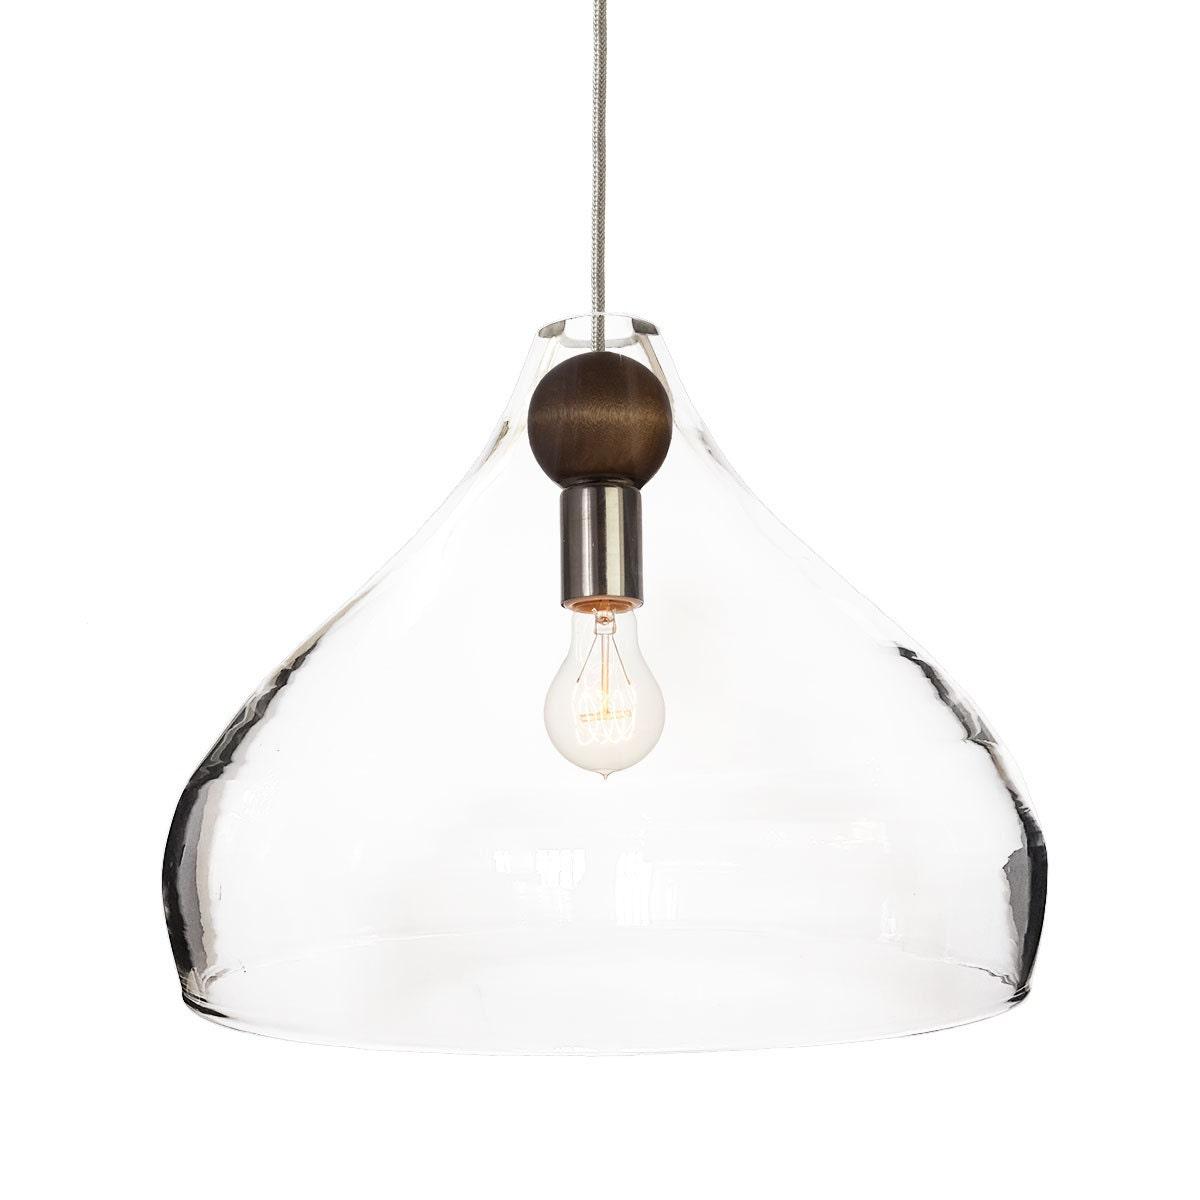 Blown Glass & Wood Drop Pendant Chandelier Light MADE IN USA